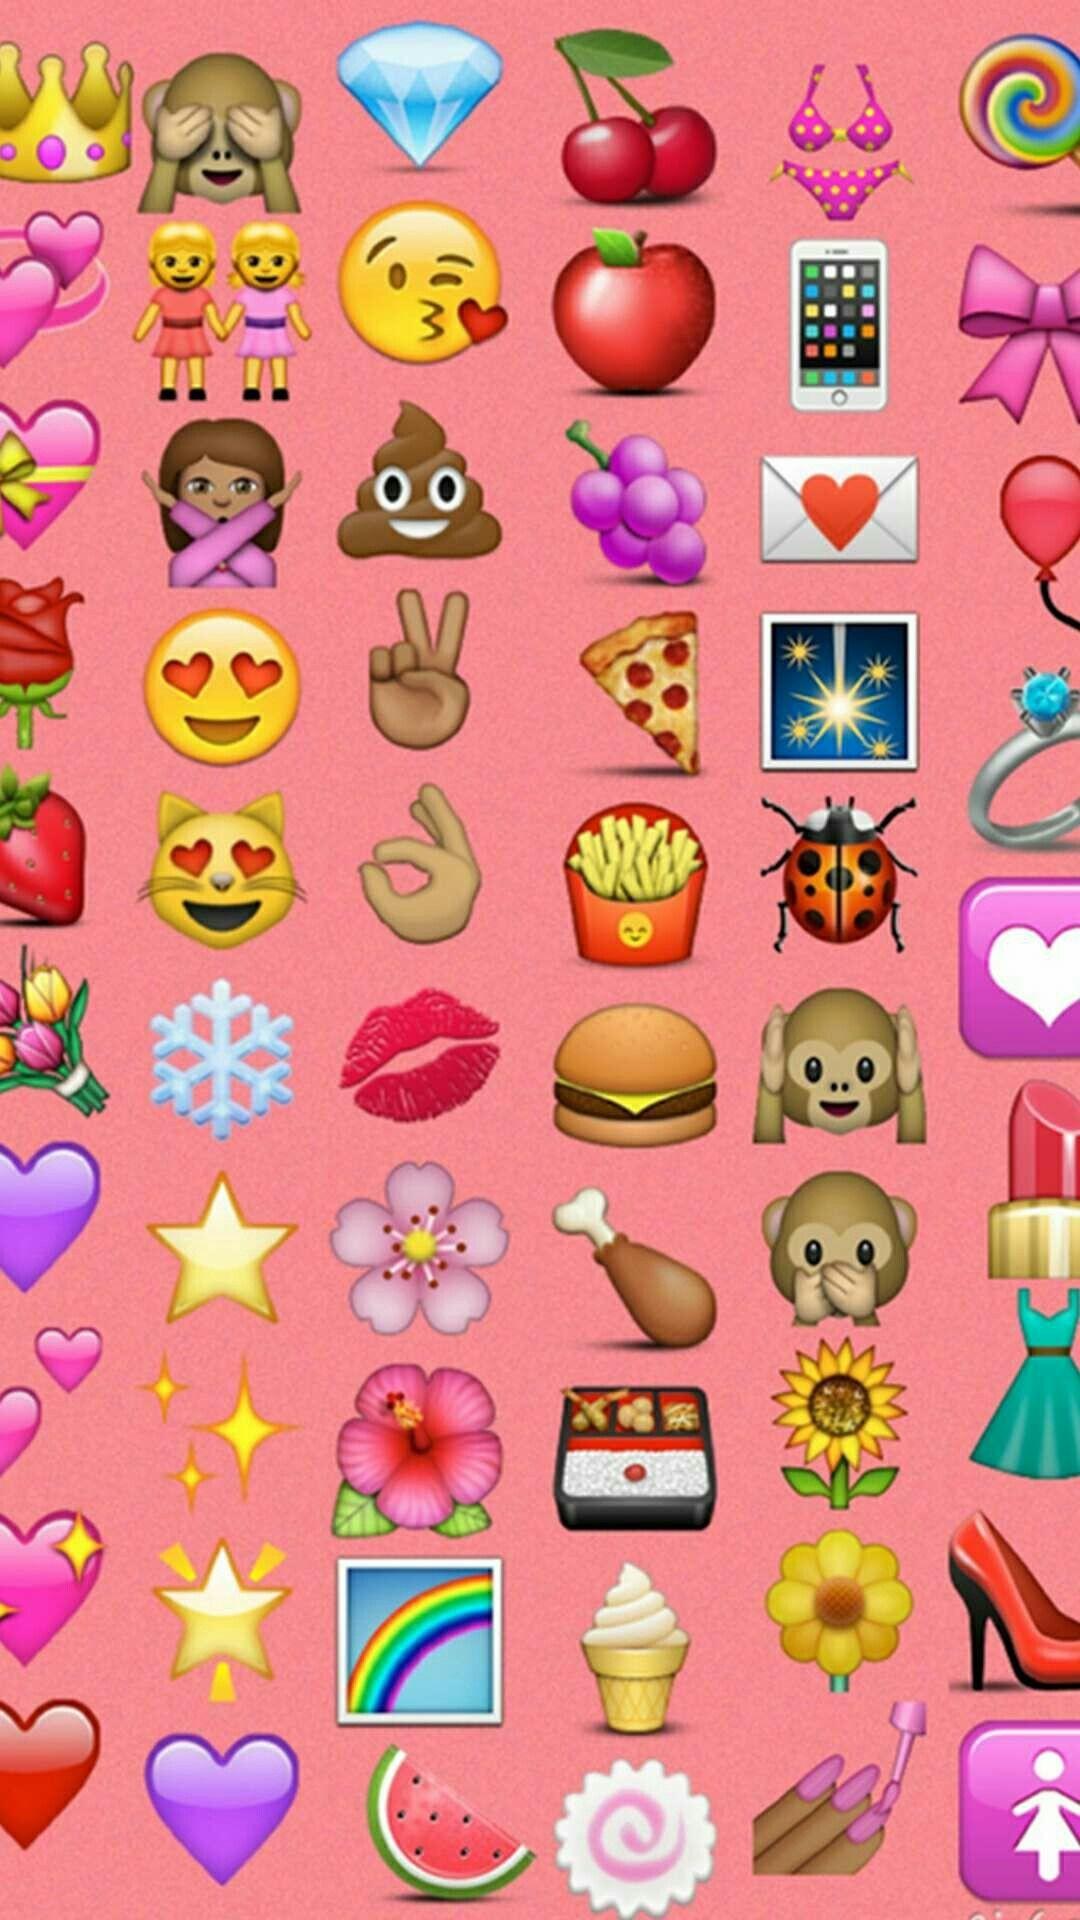 Free Download 72 Dope Emoji Wallpapers On Wallpaperplay